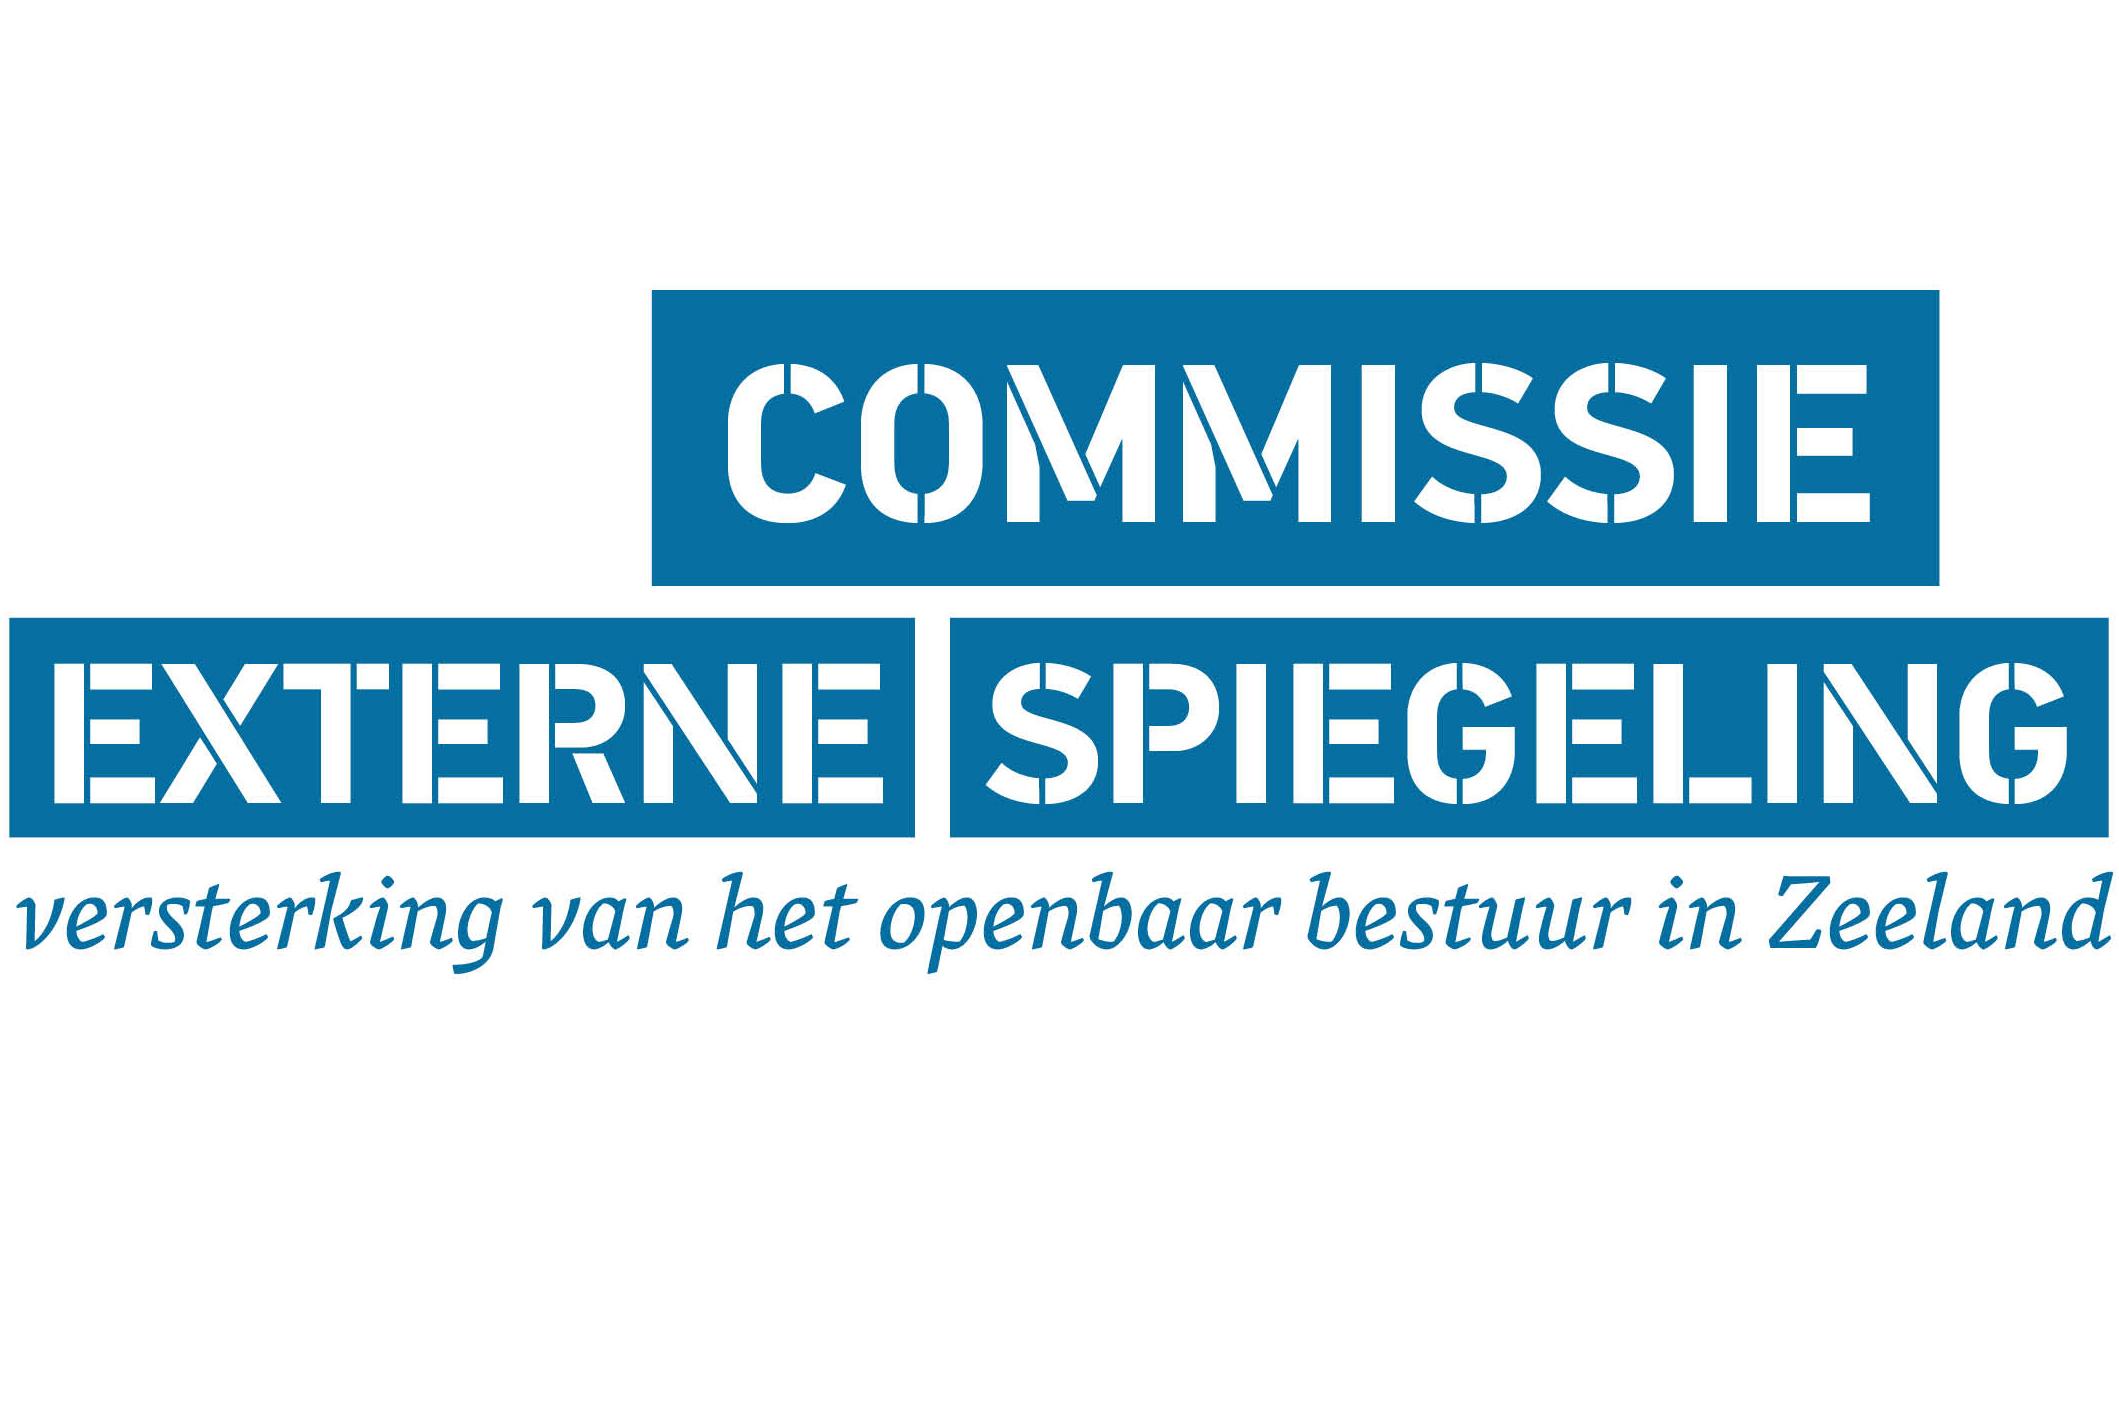 Logo Commissie externe spiegeling